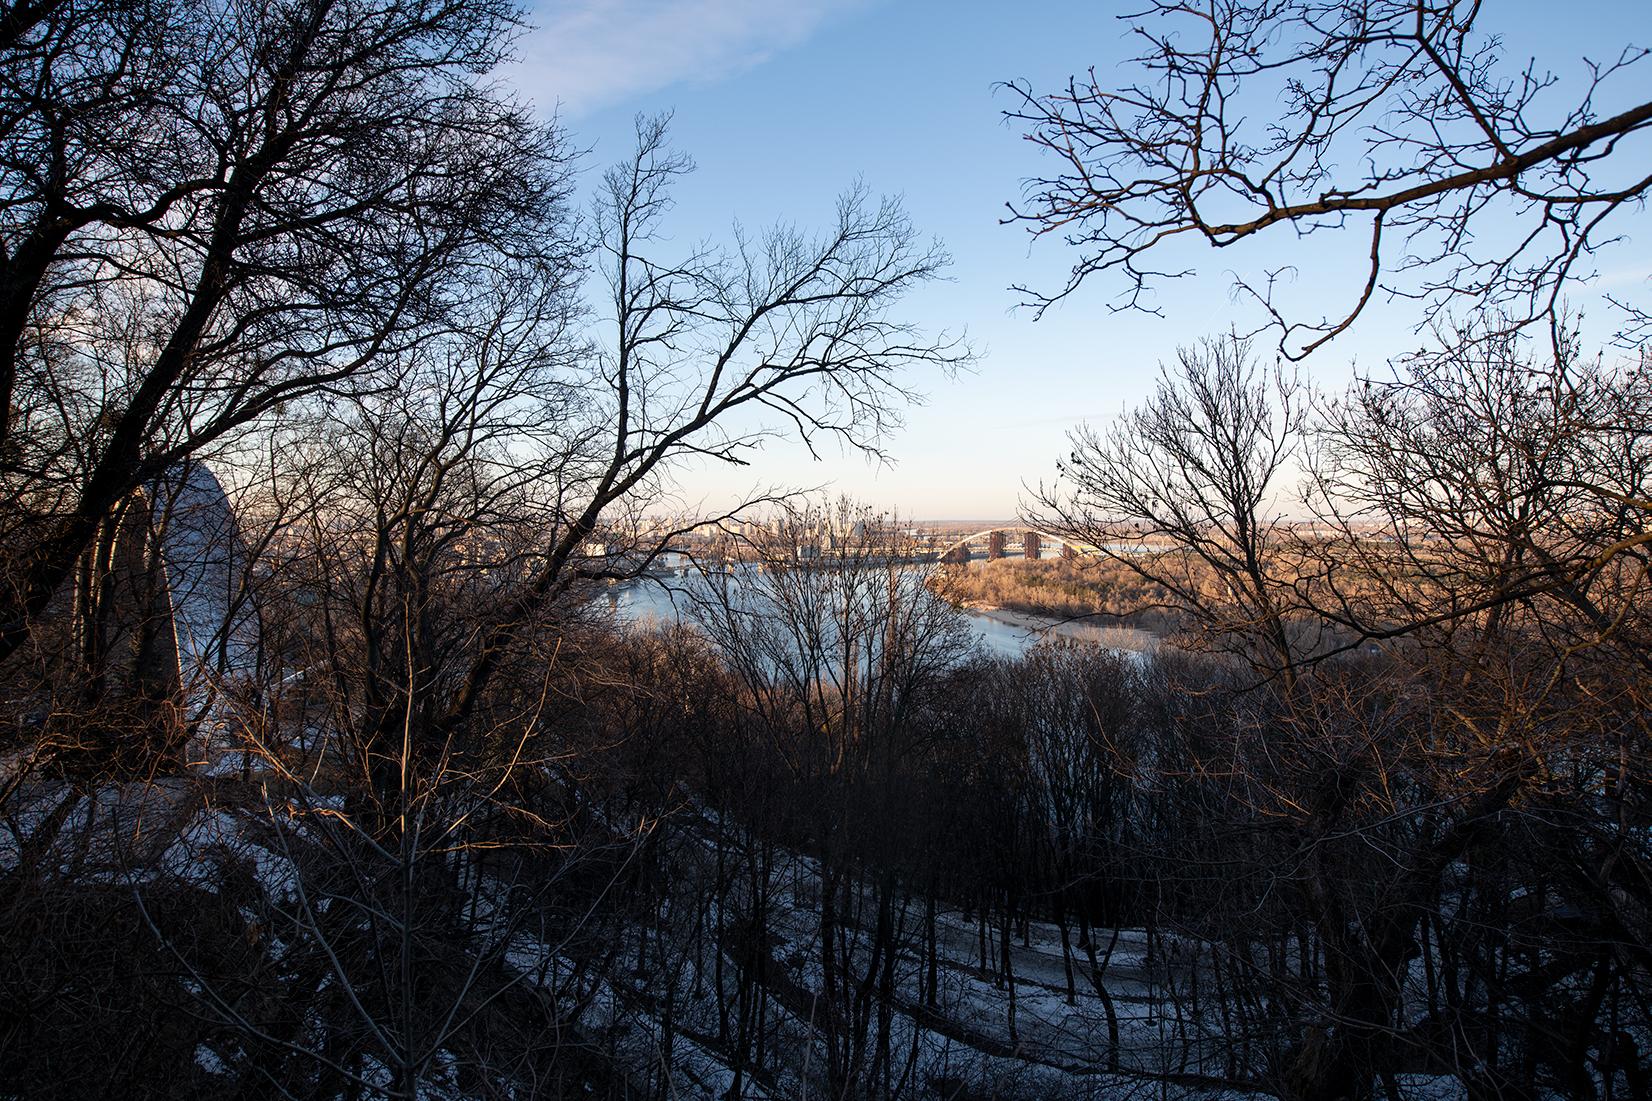 View on the Dnieper from Parkova Doroha